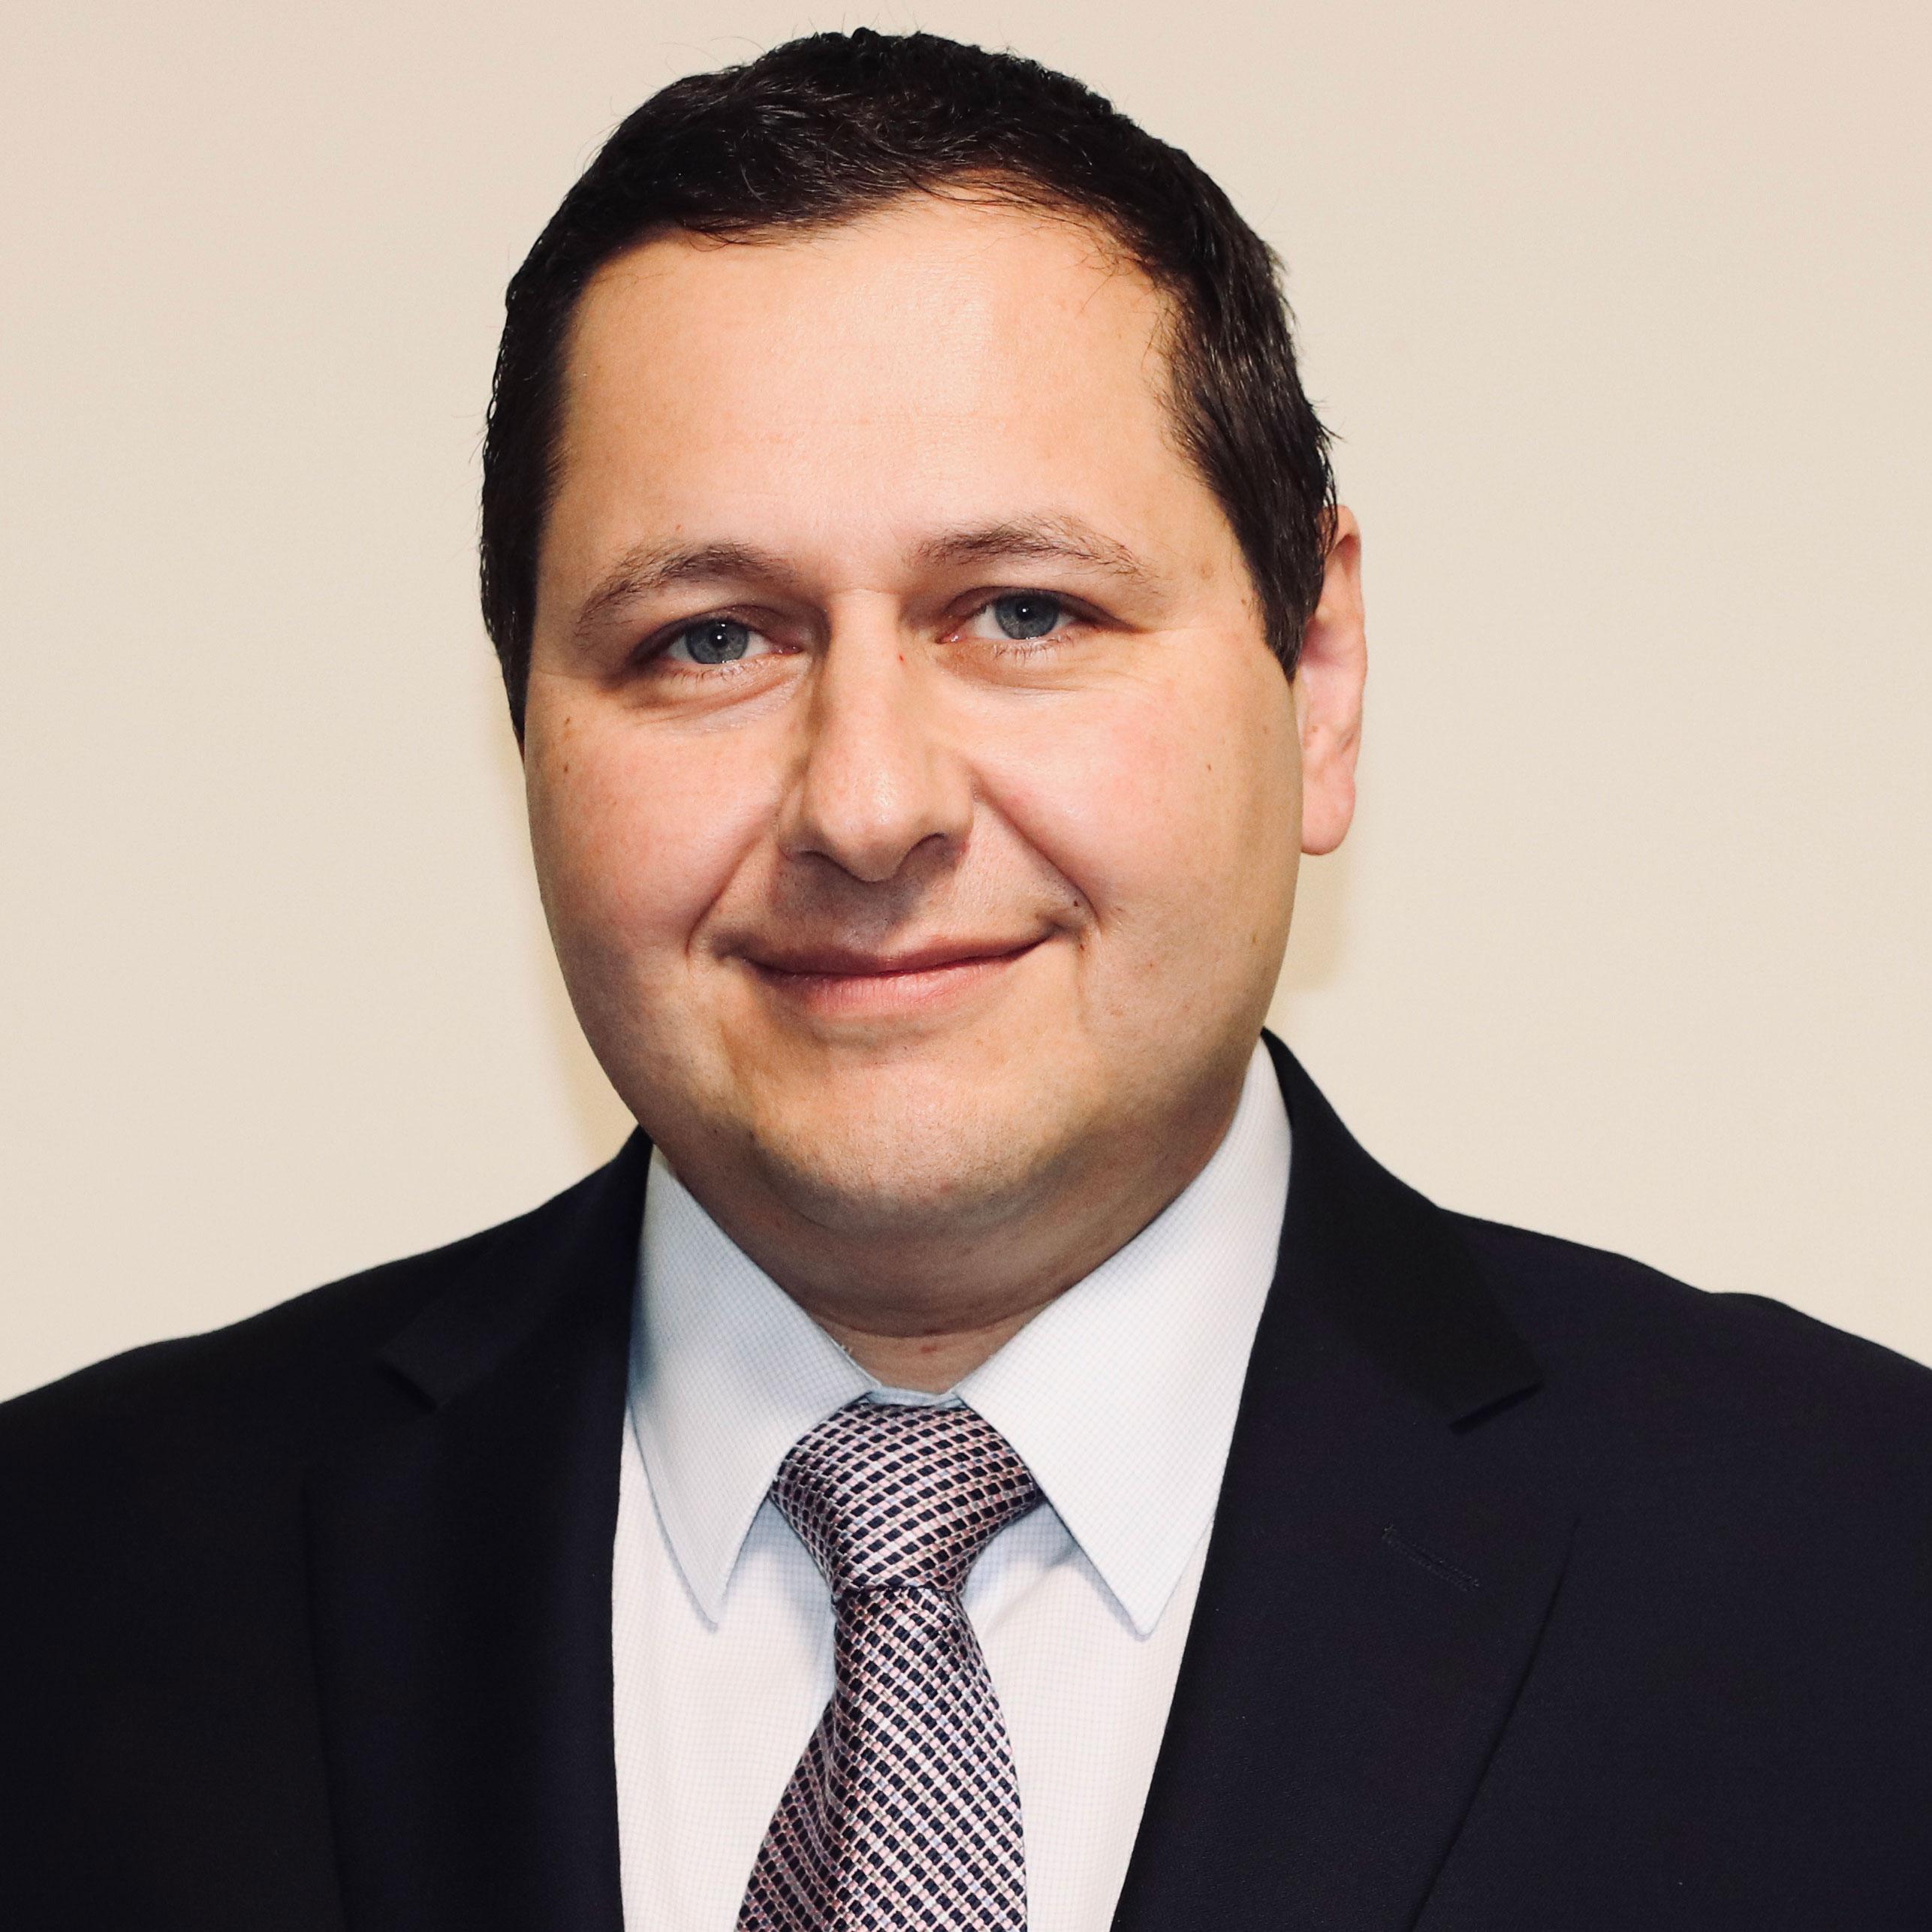 Vladan Ilic